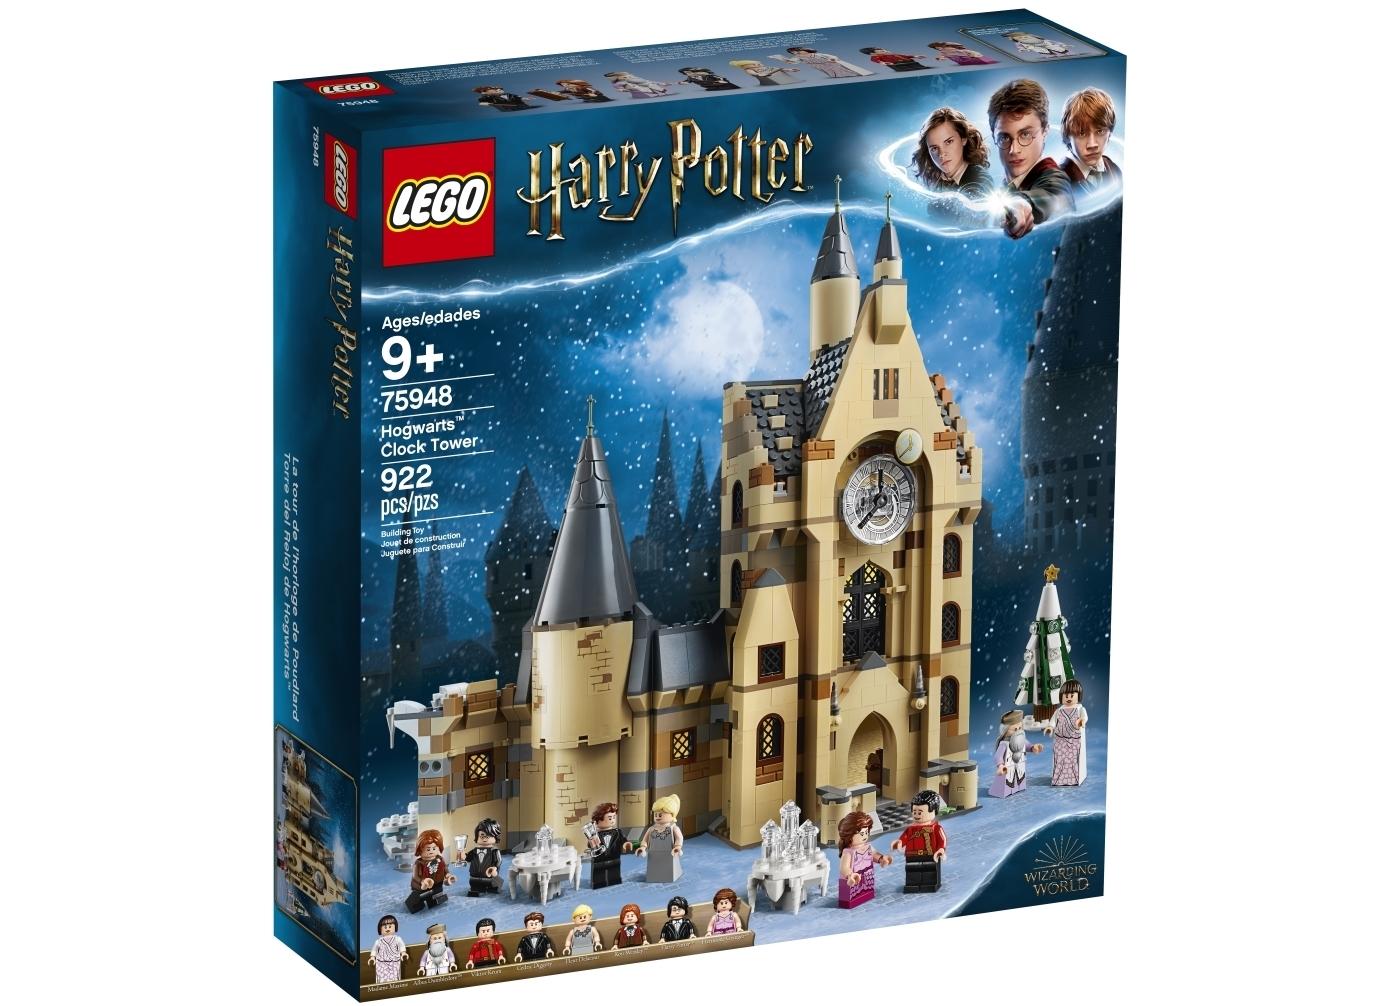 Lego has just built a Hogwarts extension